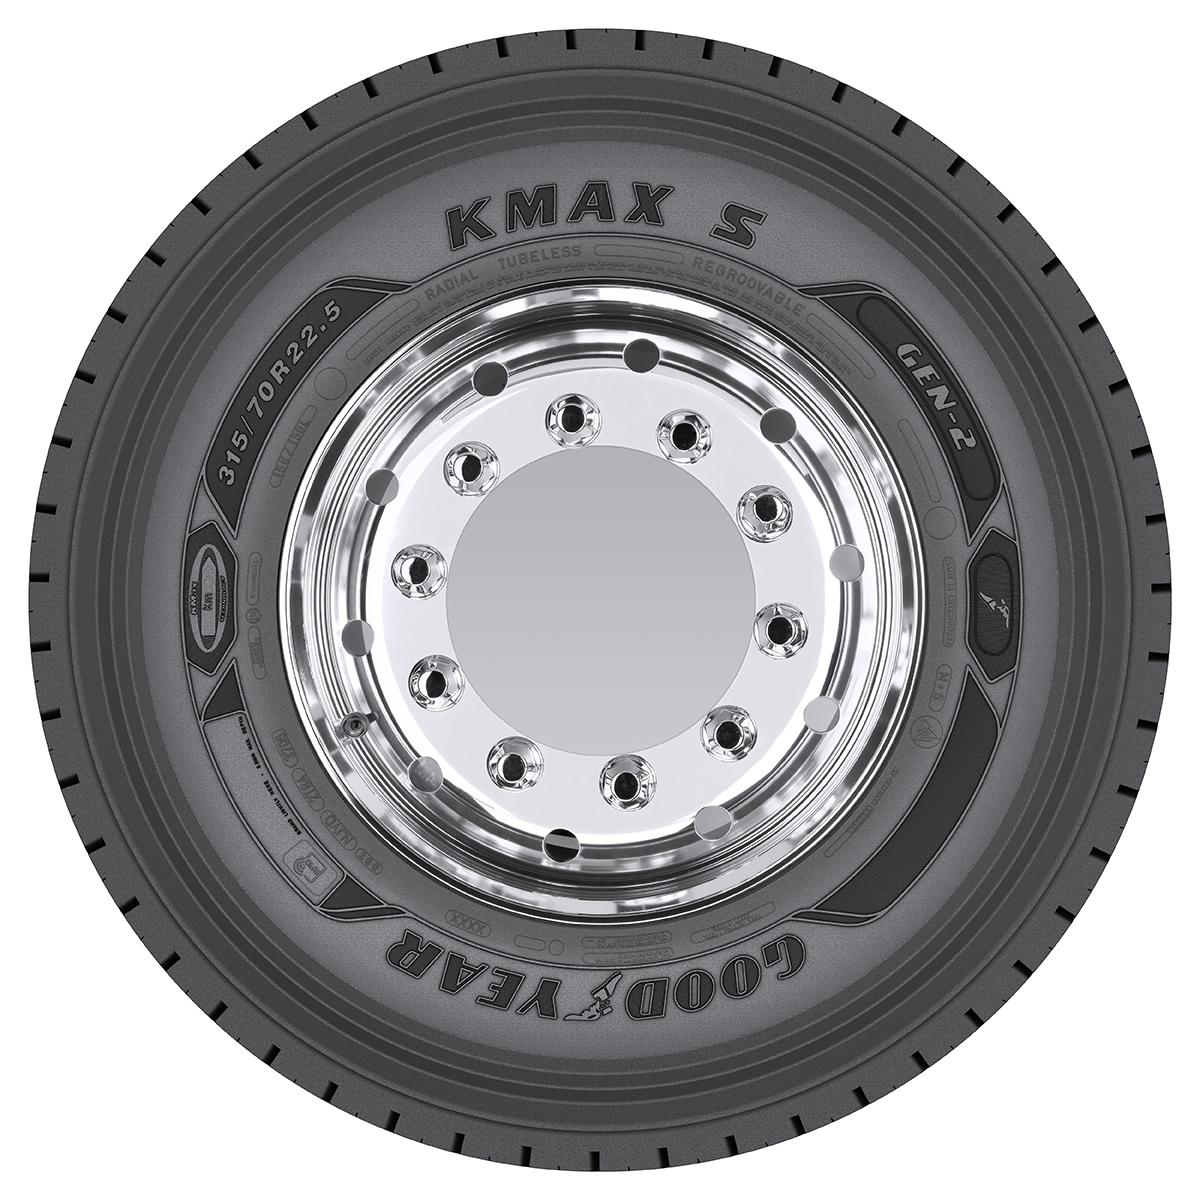 Goodyear a lansat noile generații de anvelope pentru camion KMax GEN-2 și Fuelmax GEN-2